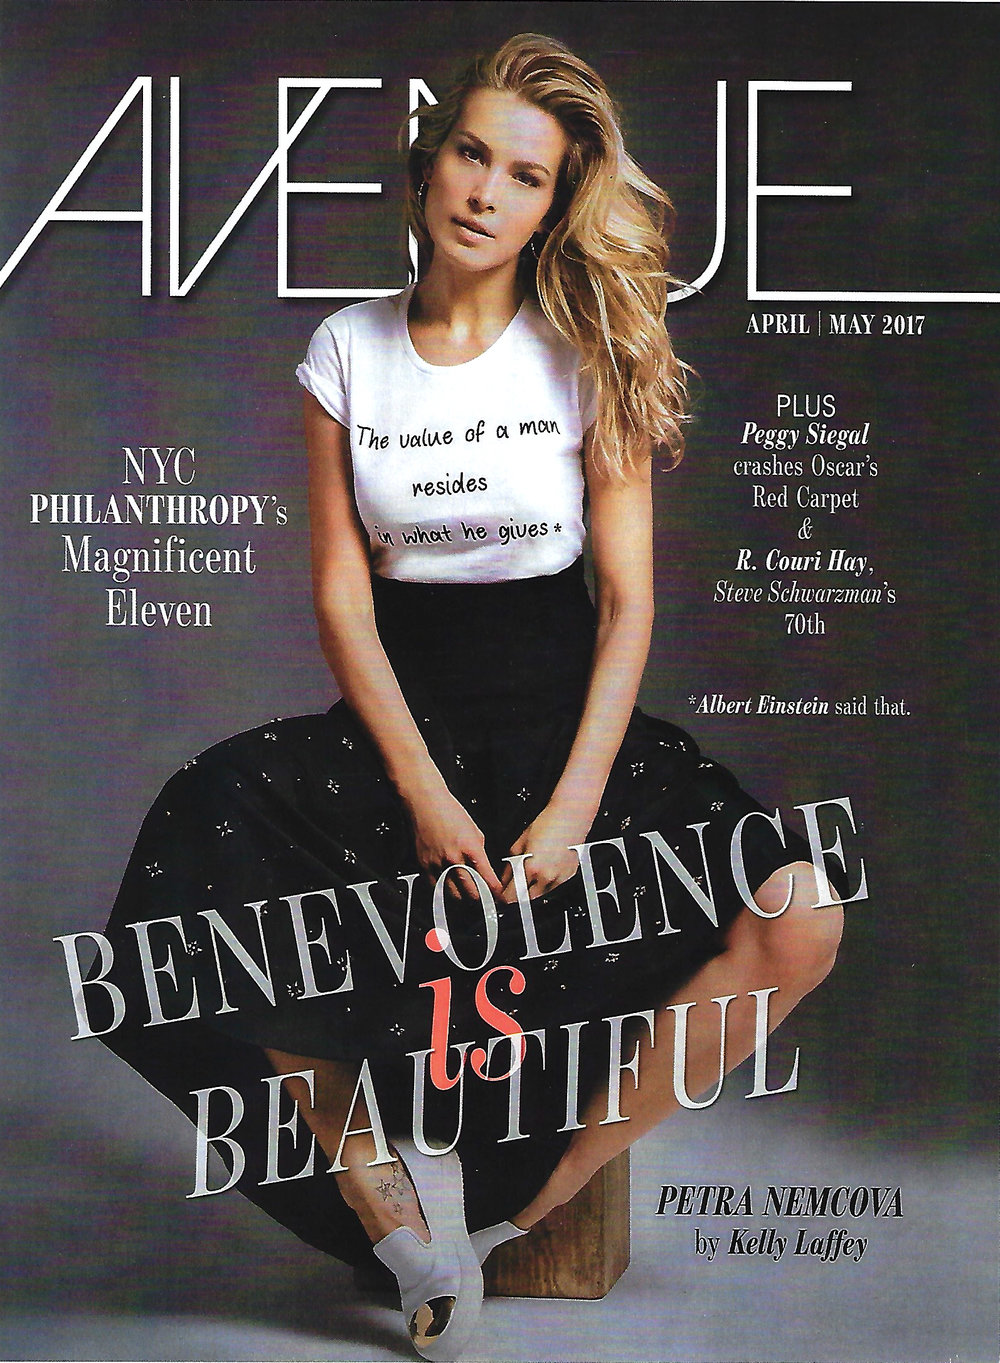 Avenue Magazine - True Colors_cover_May 2017.jpg